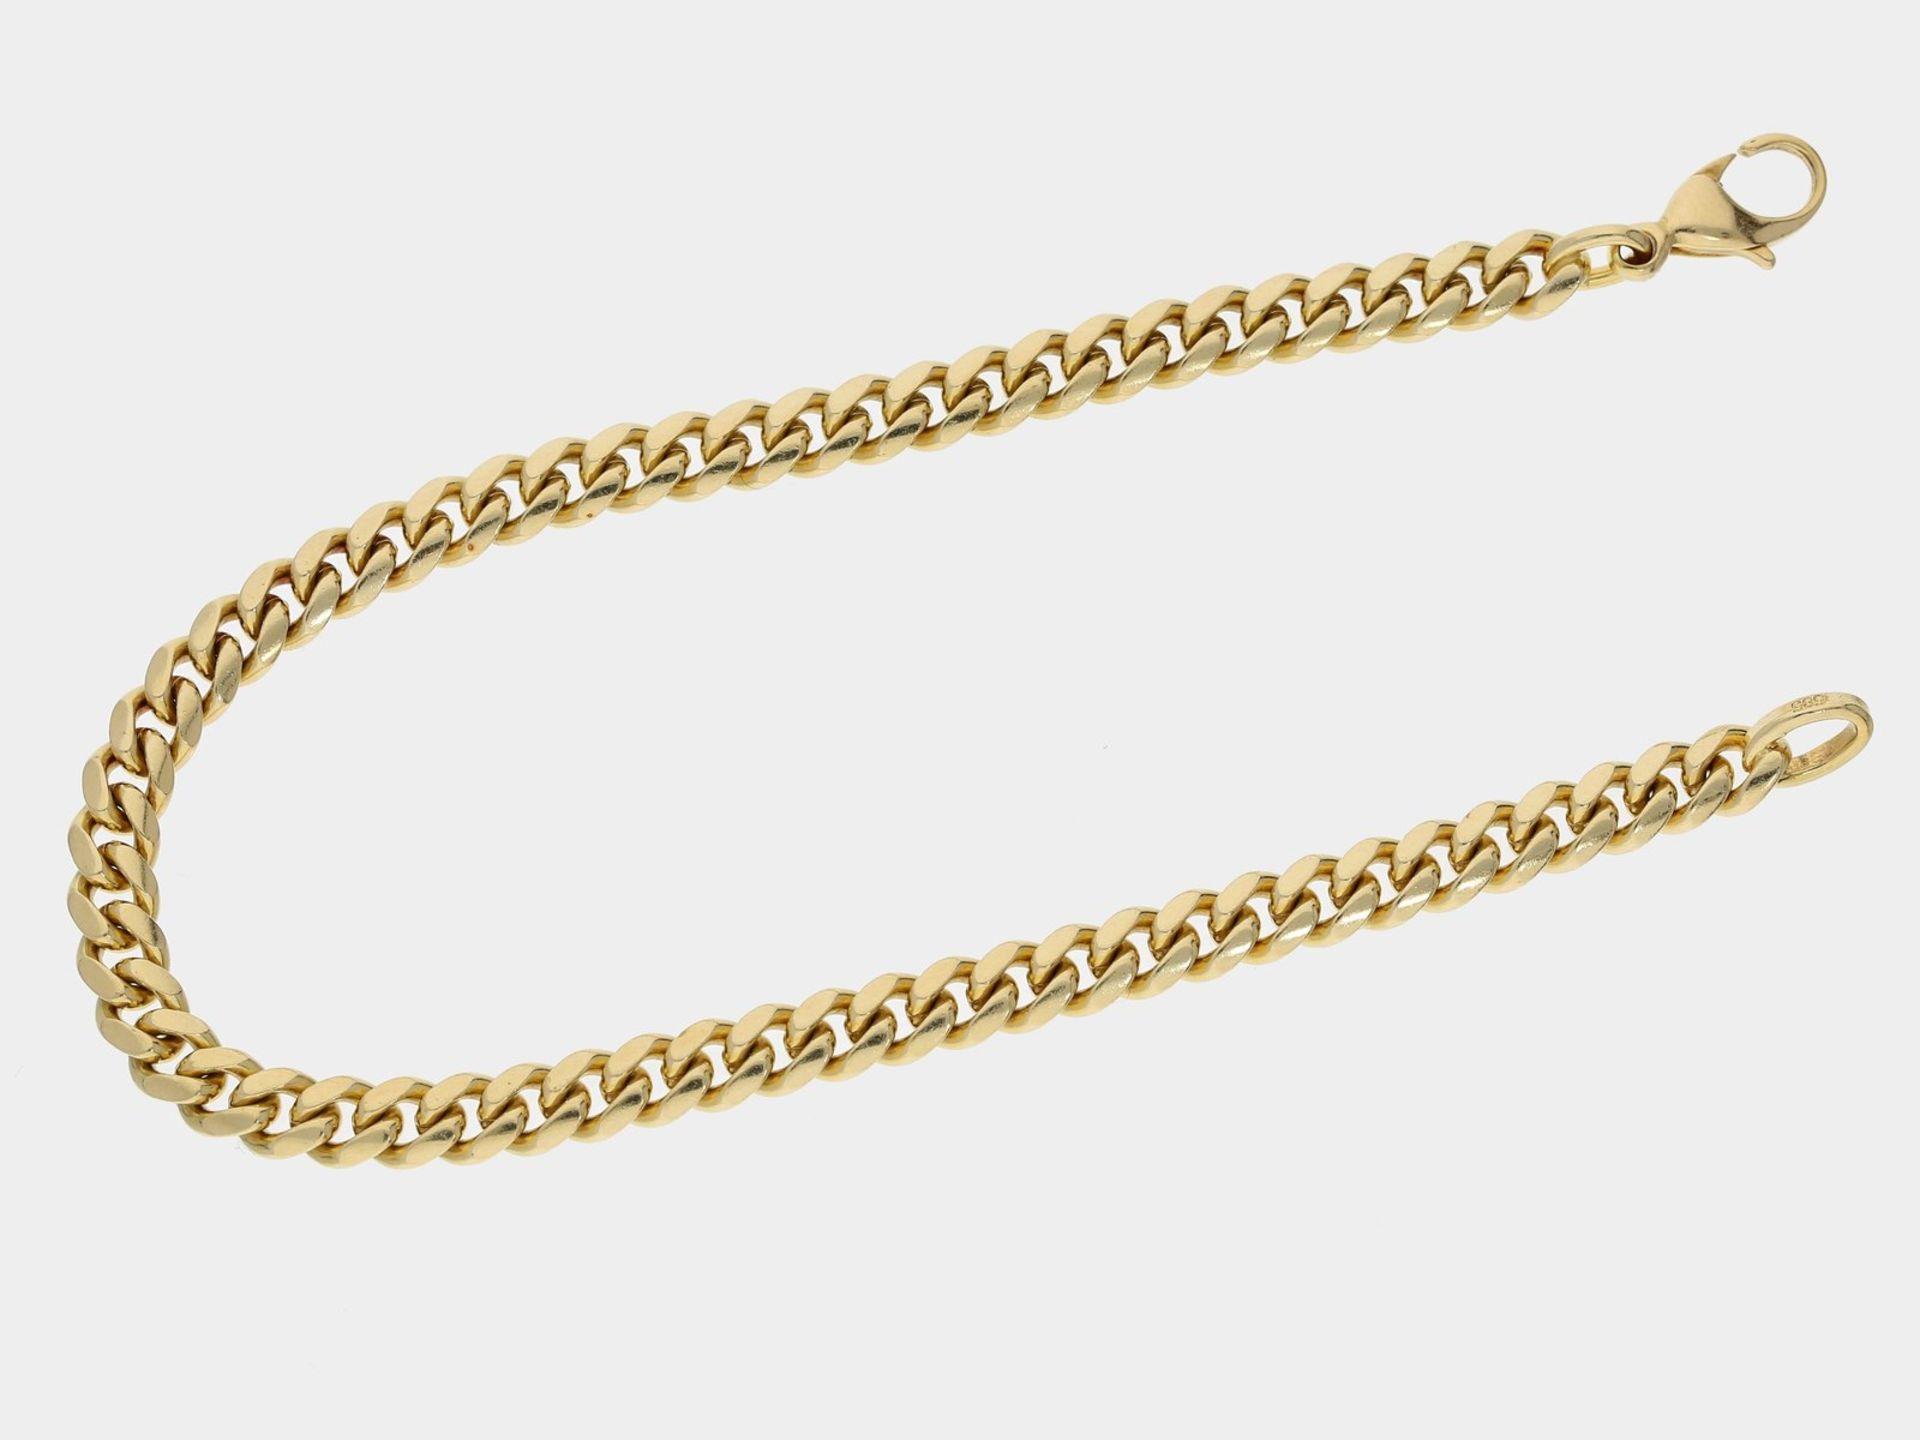 Armband: massives goldenes Panzerarmband, 14K Gelbgold Ca. 21,5cm lang, ca. 5mm breit, ca. 17,1g,